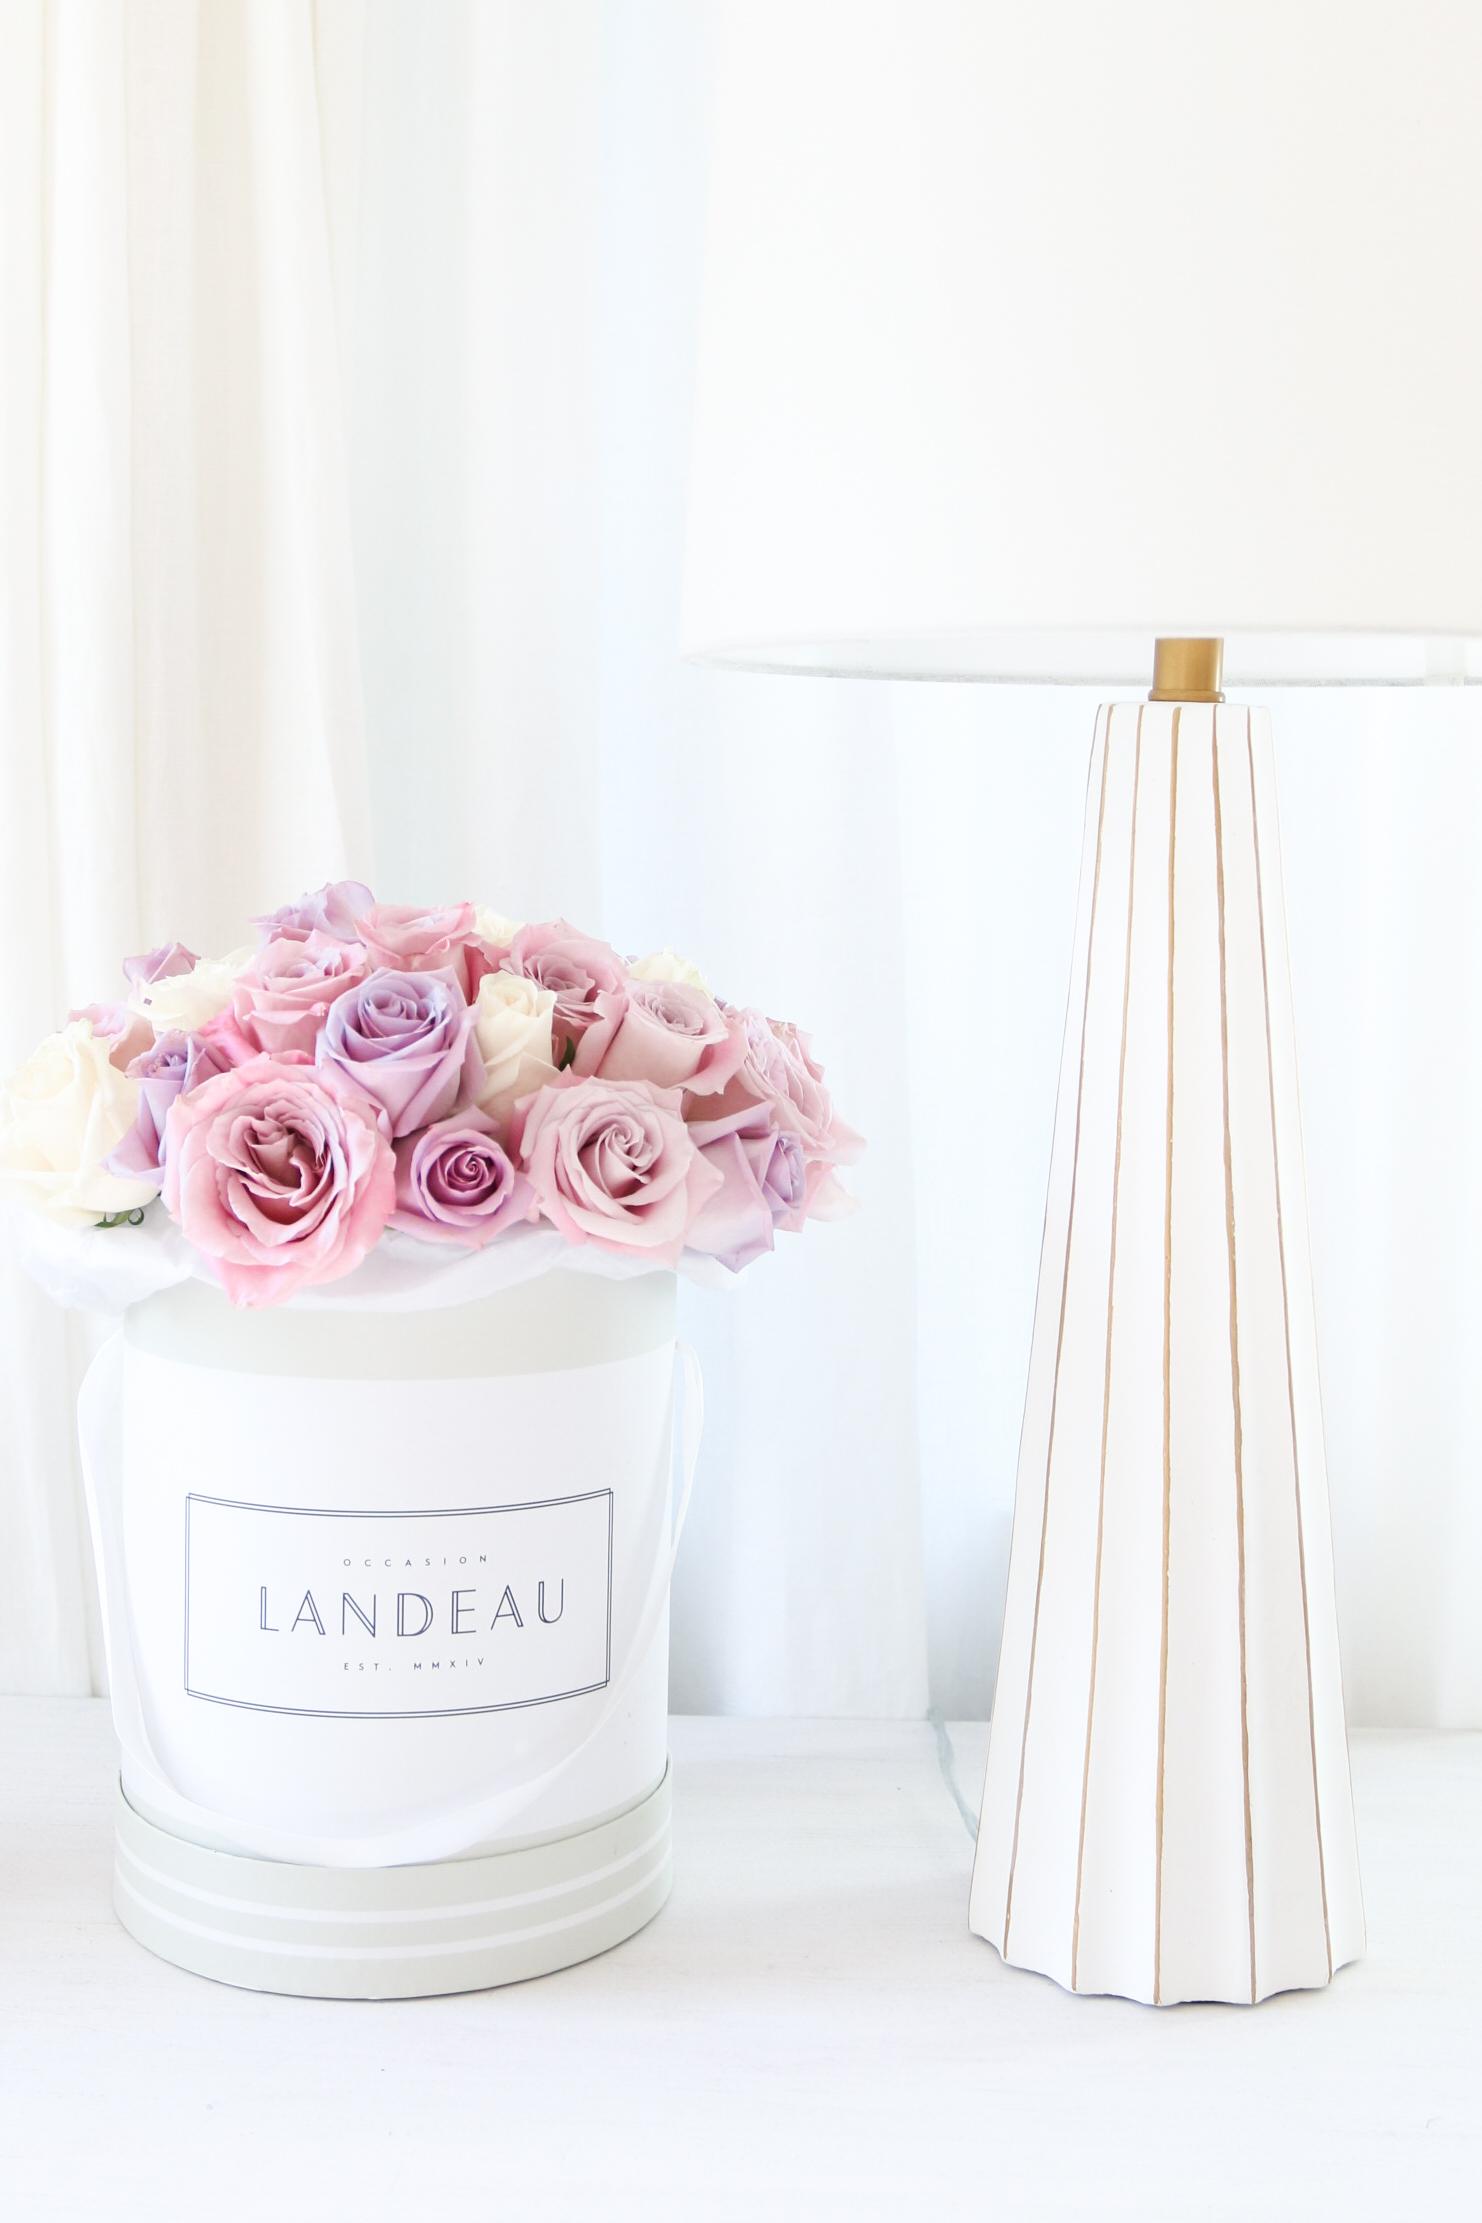 Landeau rosed in box bucket Monika Hibbs